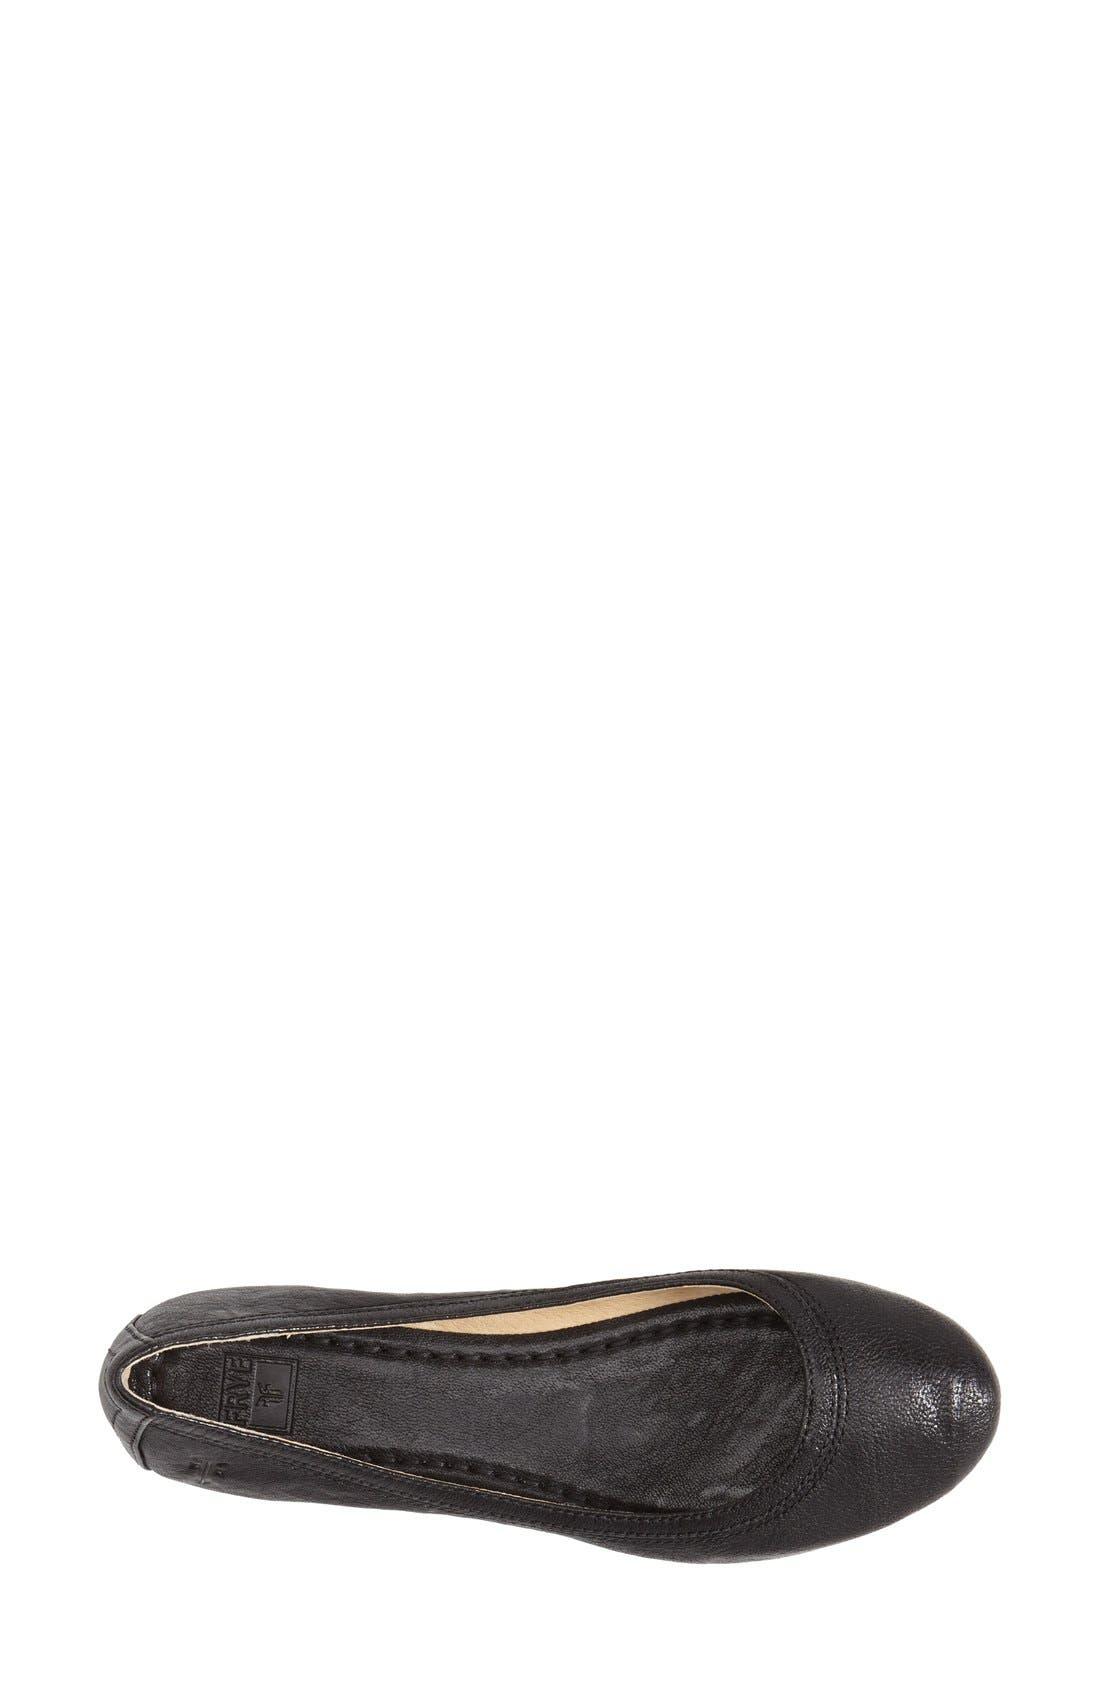 'Carson' Ballet Flat,                             Alternate thumbnail 3, color,                             Black/ Black Leather